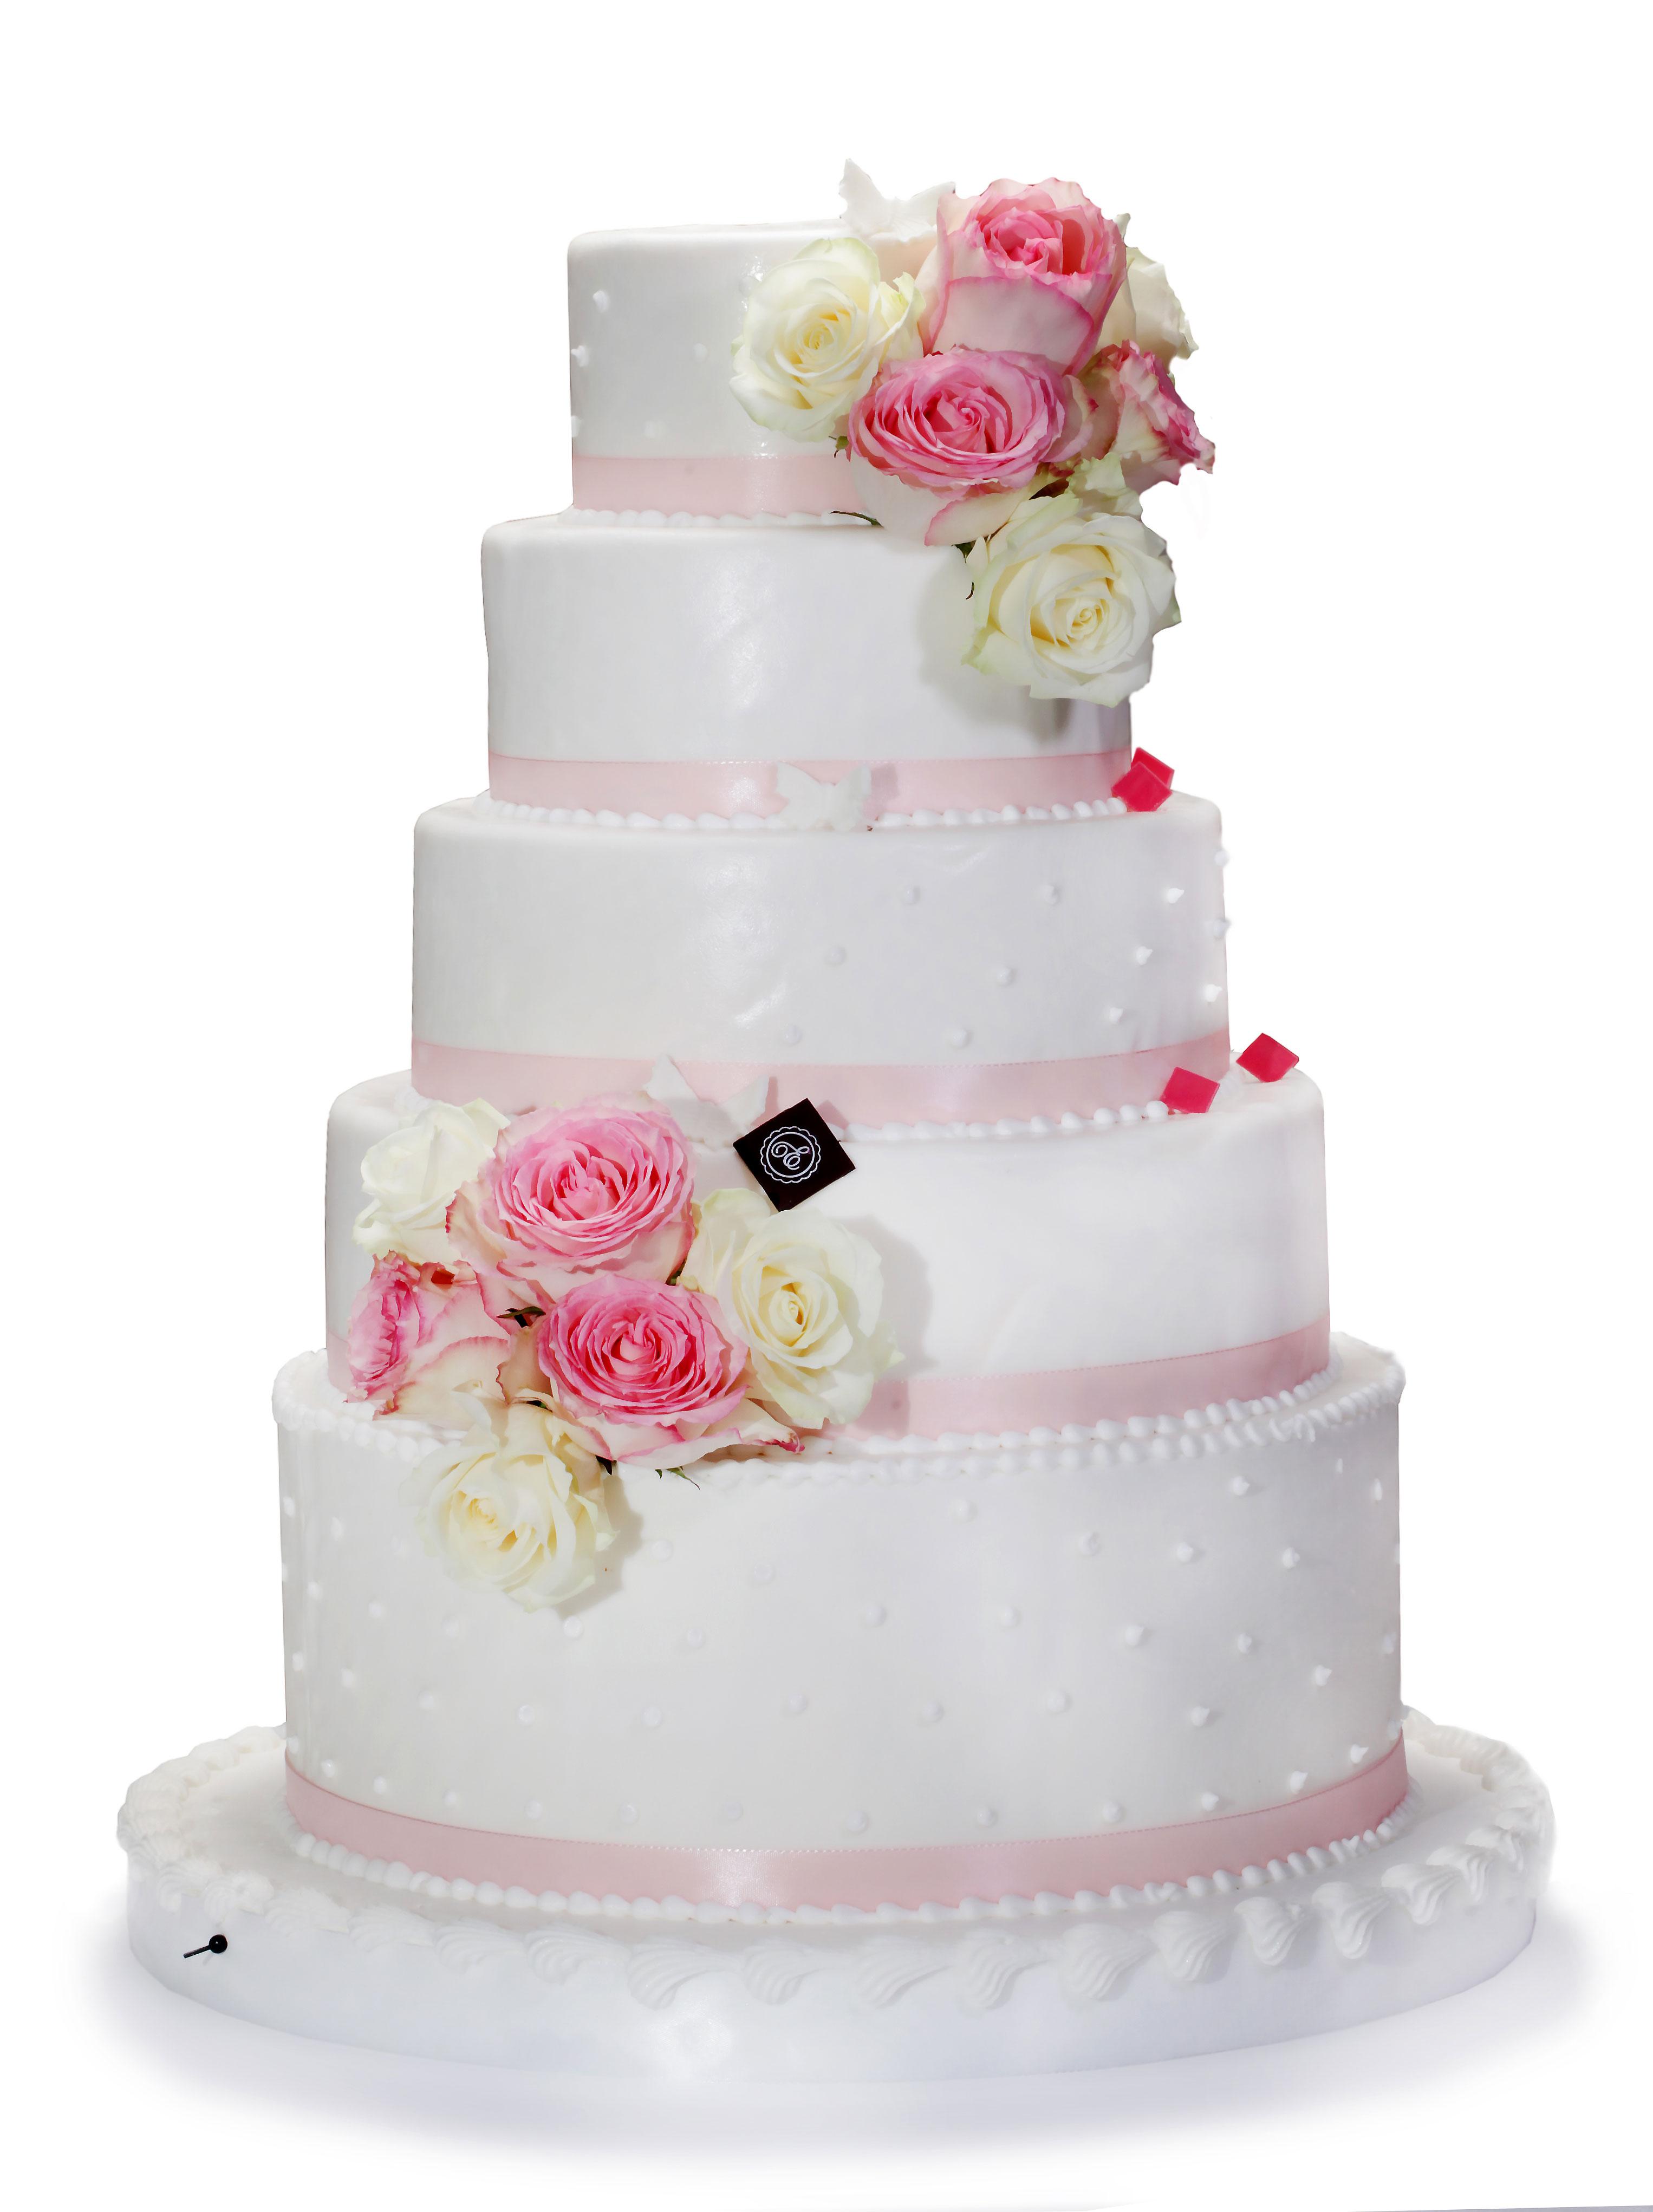 Wedding Cake Chouette